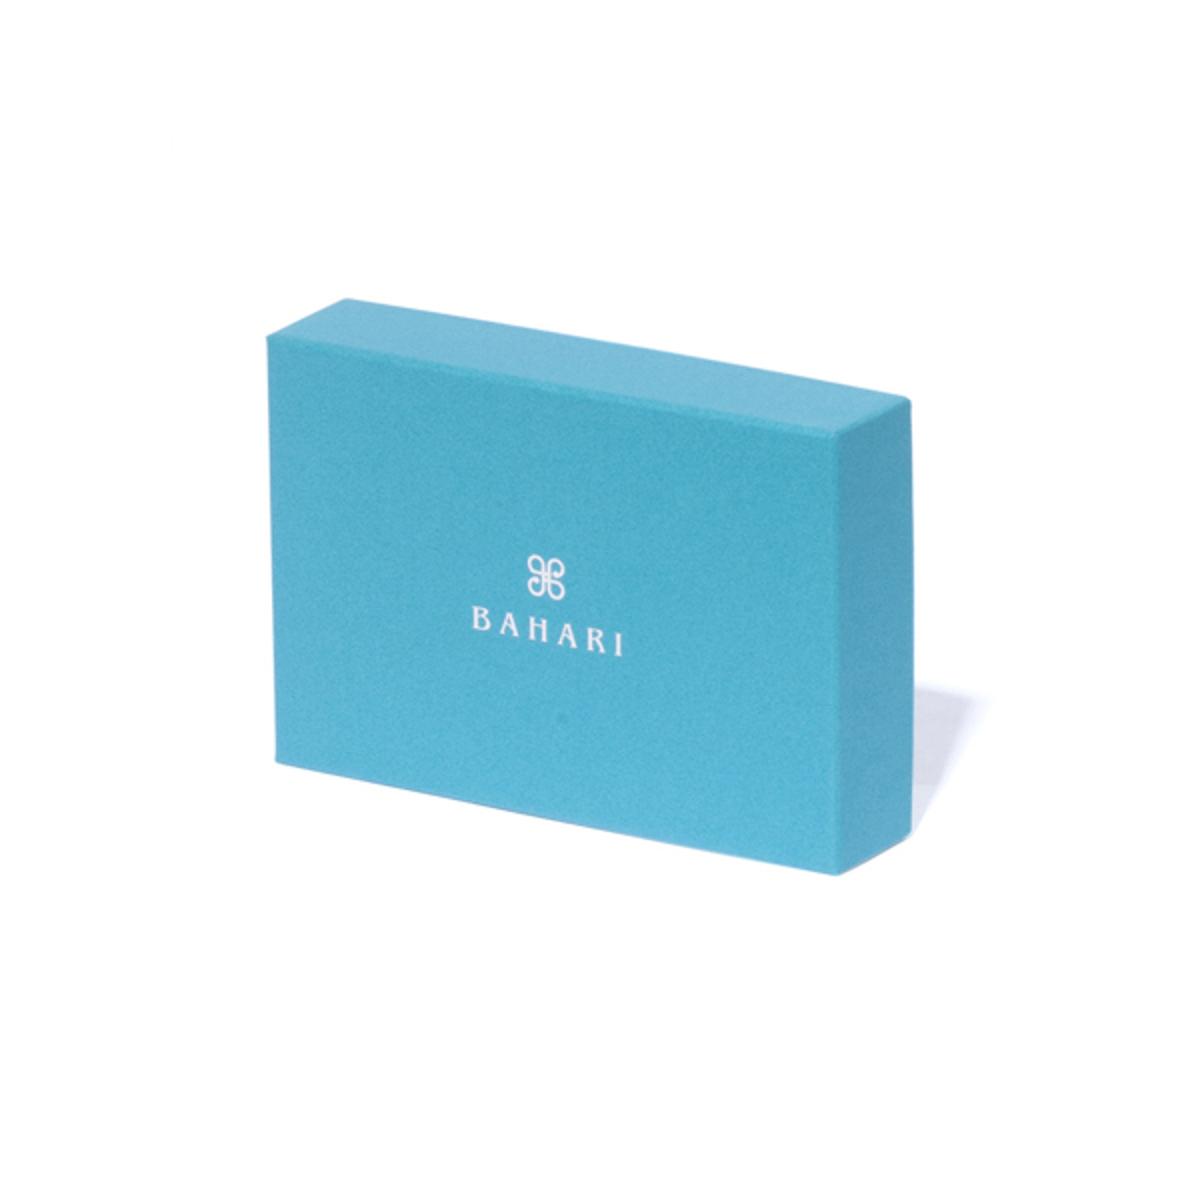 "BAHARI|""海の宝石箱""と呼ばれるほどの耐久性と美しさ | ガルーシャ(エイ革)コインケース / UNION JACK"